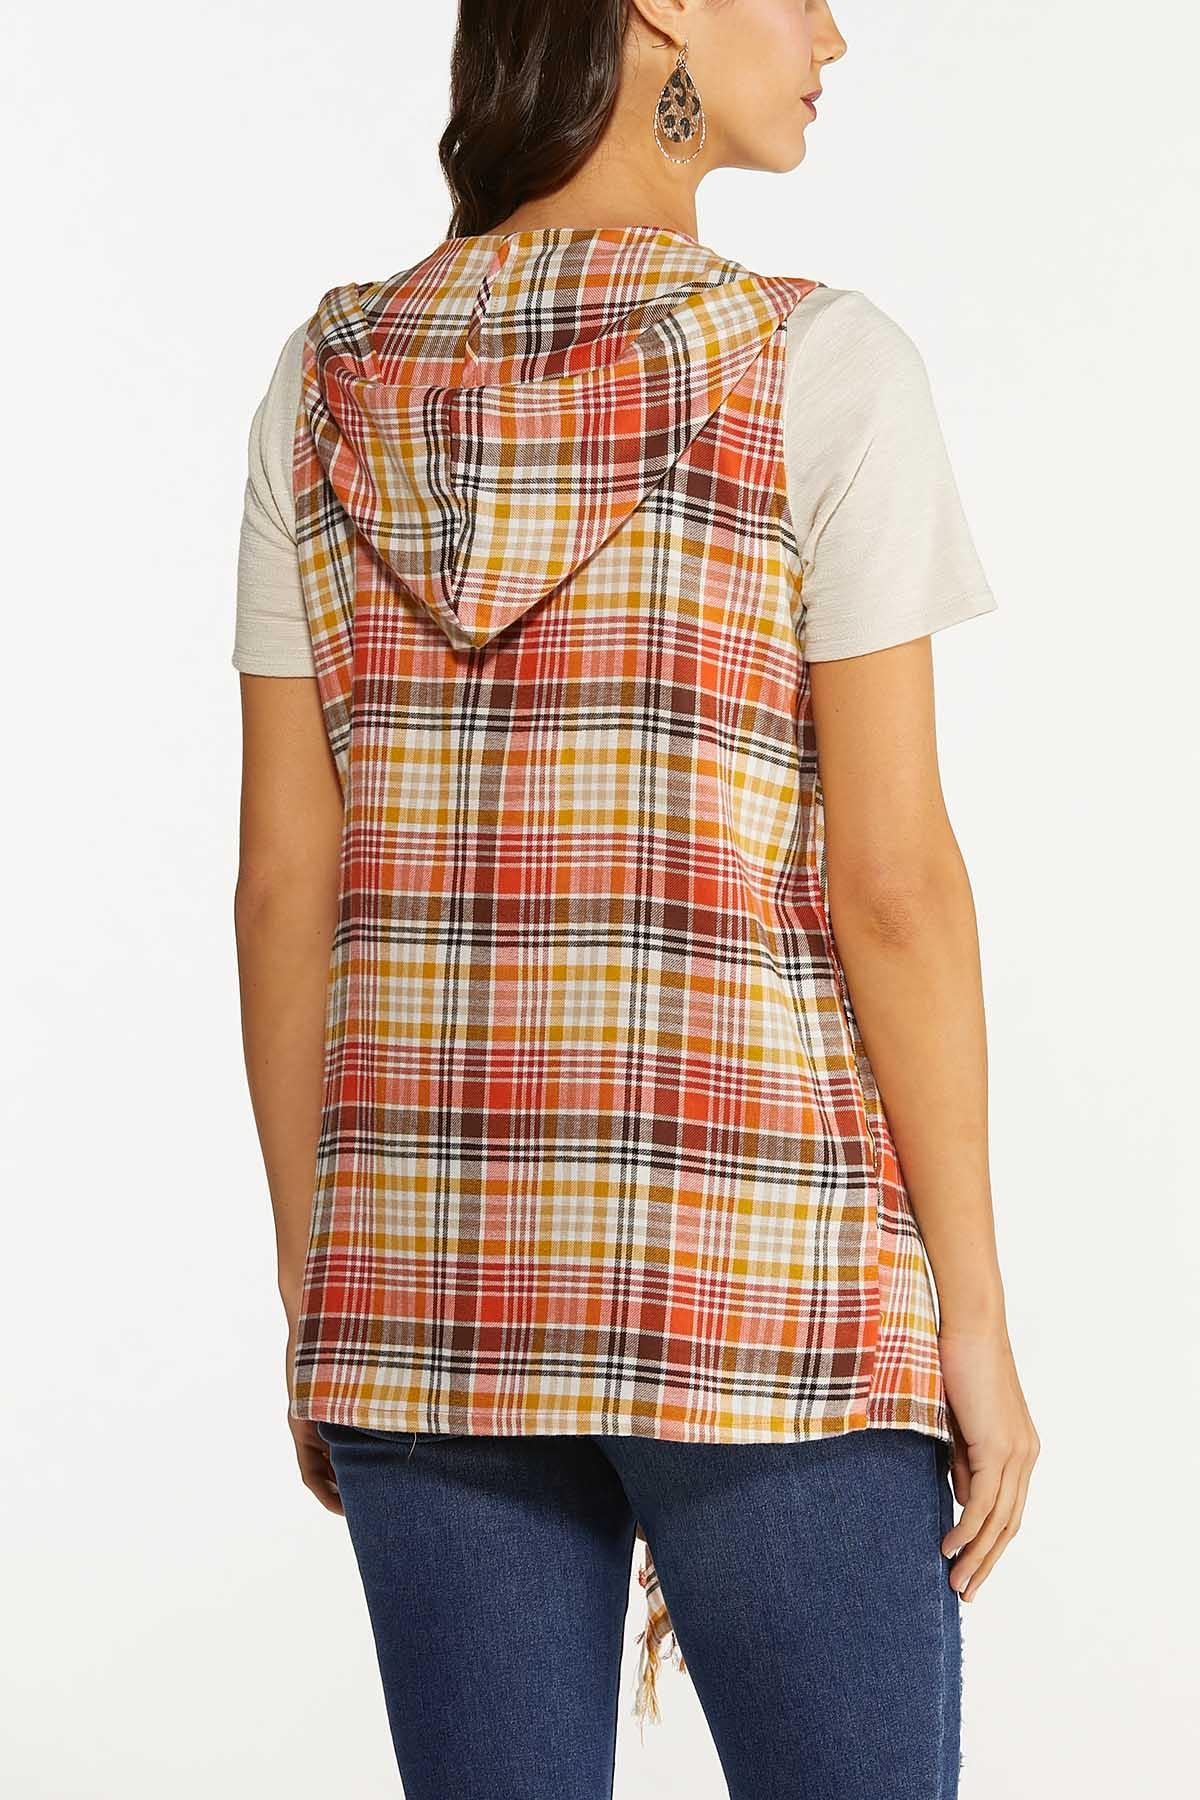 Pumpkin Spice Plaid Vest (Item #44665037)